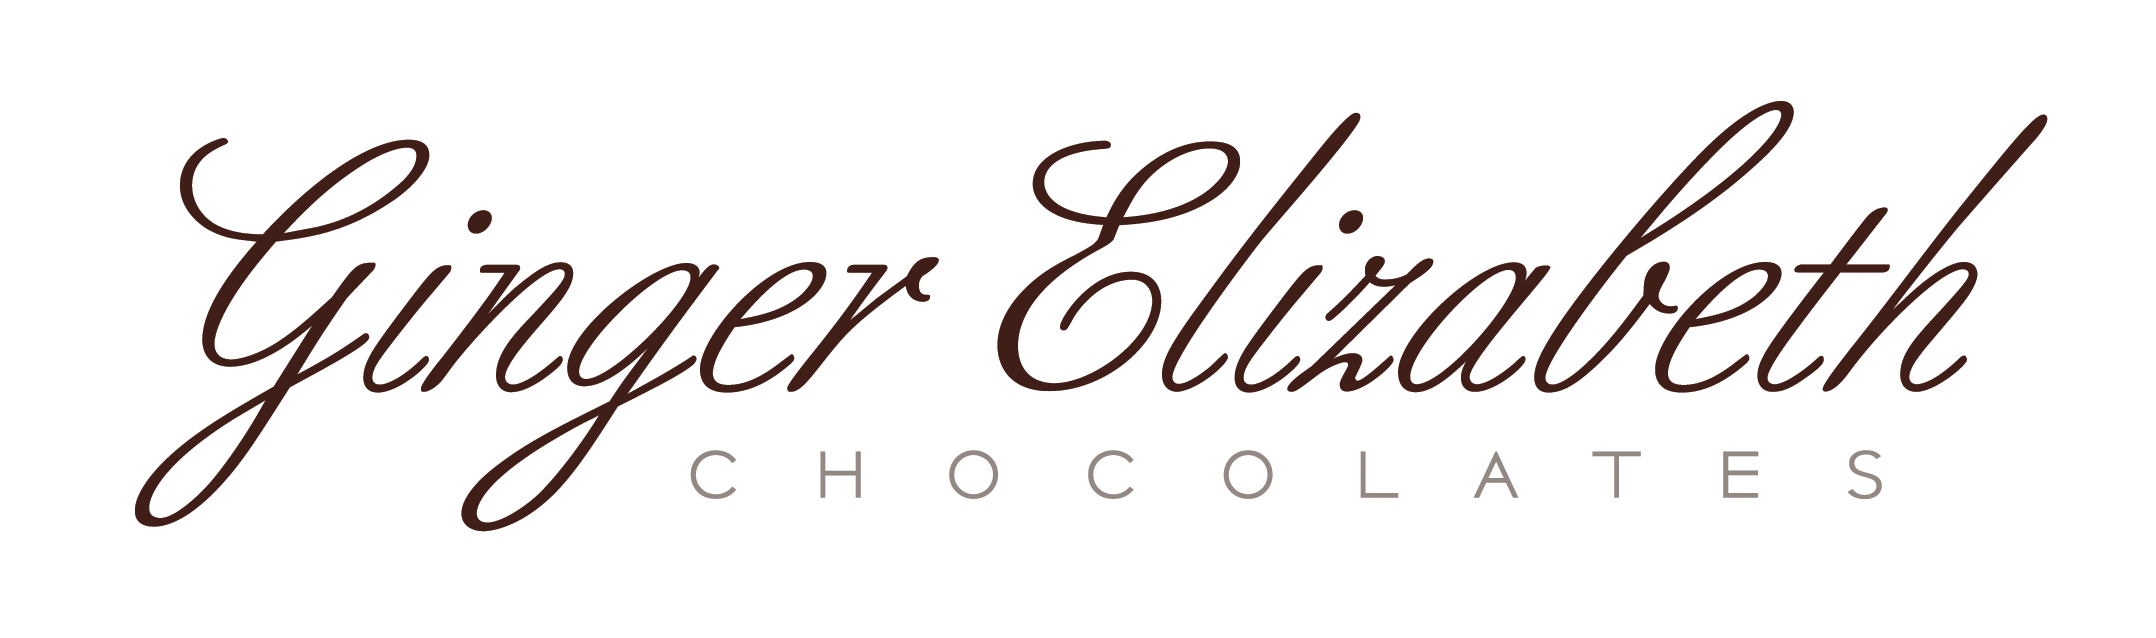 Ginger Elizabeth Chocolates Logo CMYK.jpg